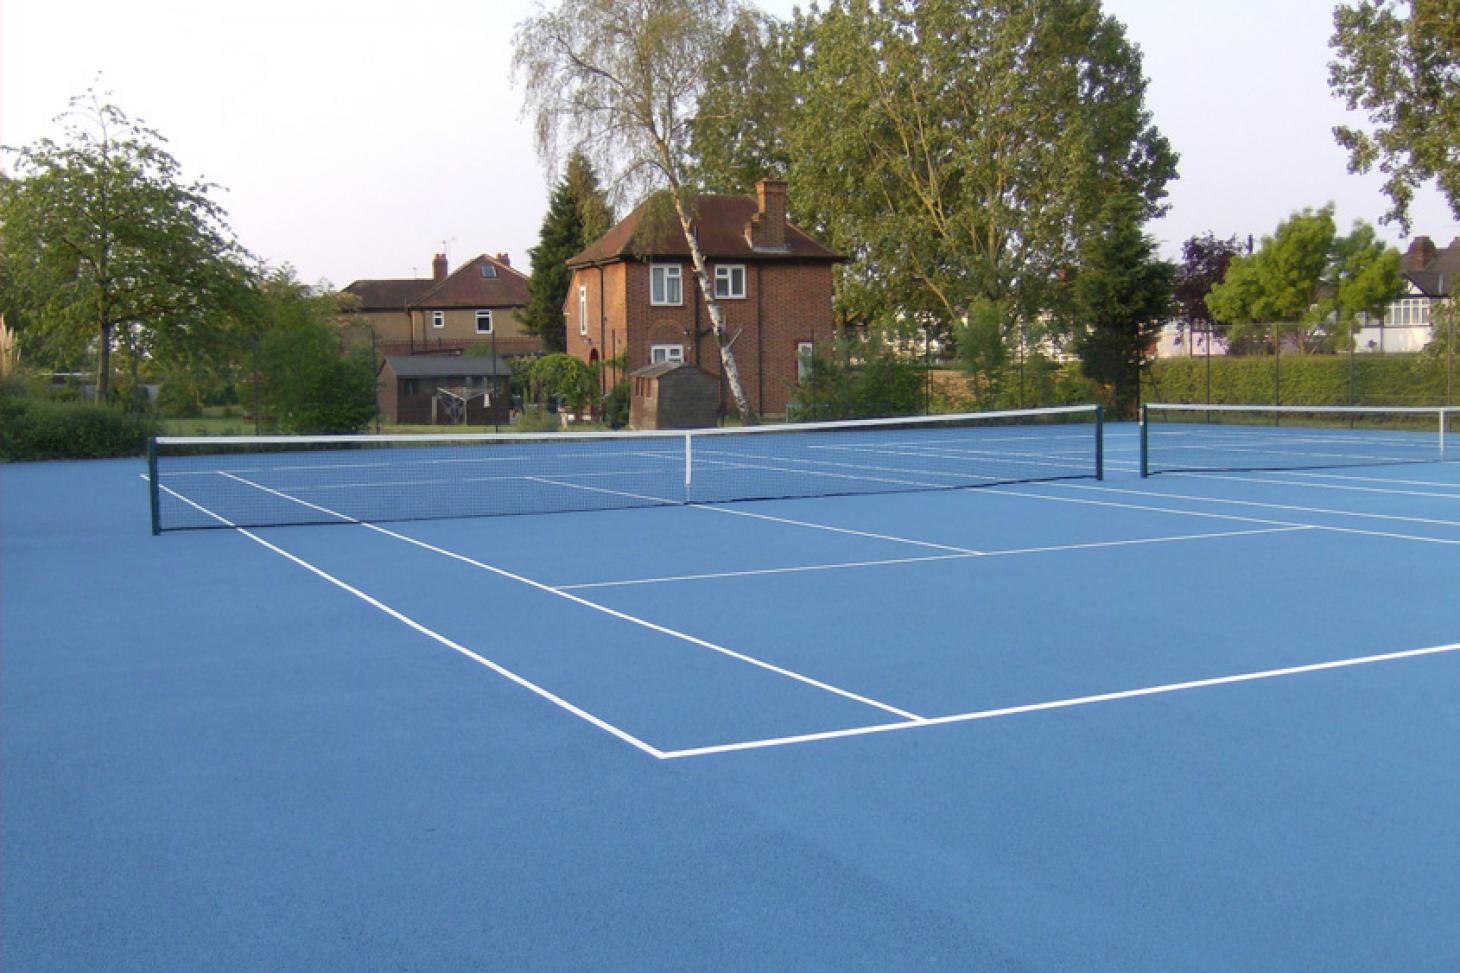 Centenary Park Sports Club Outdoor | Hard (macadam) tennis court